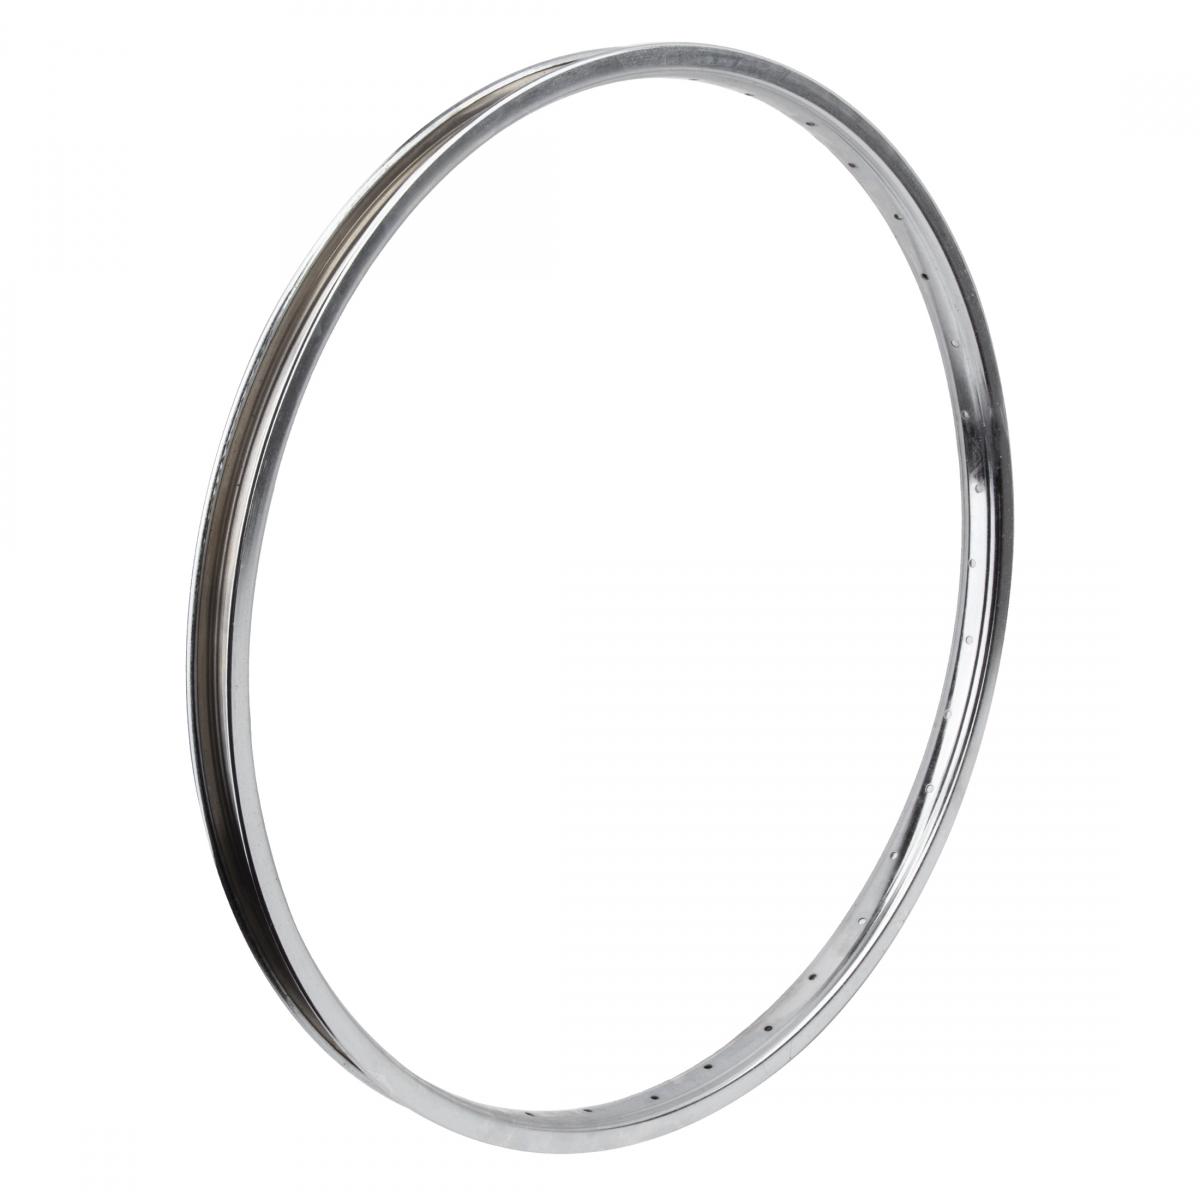 Wheel Master Steel 7X Rims 20In Wheel Master Steel 7X 406 36h Sgl Nmsw Chro